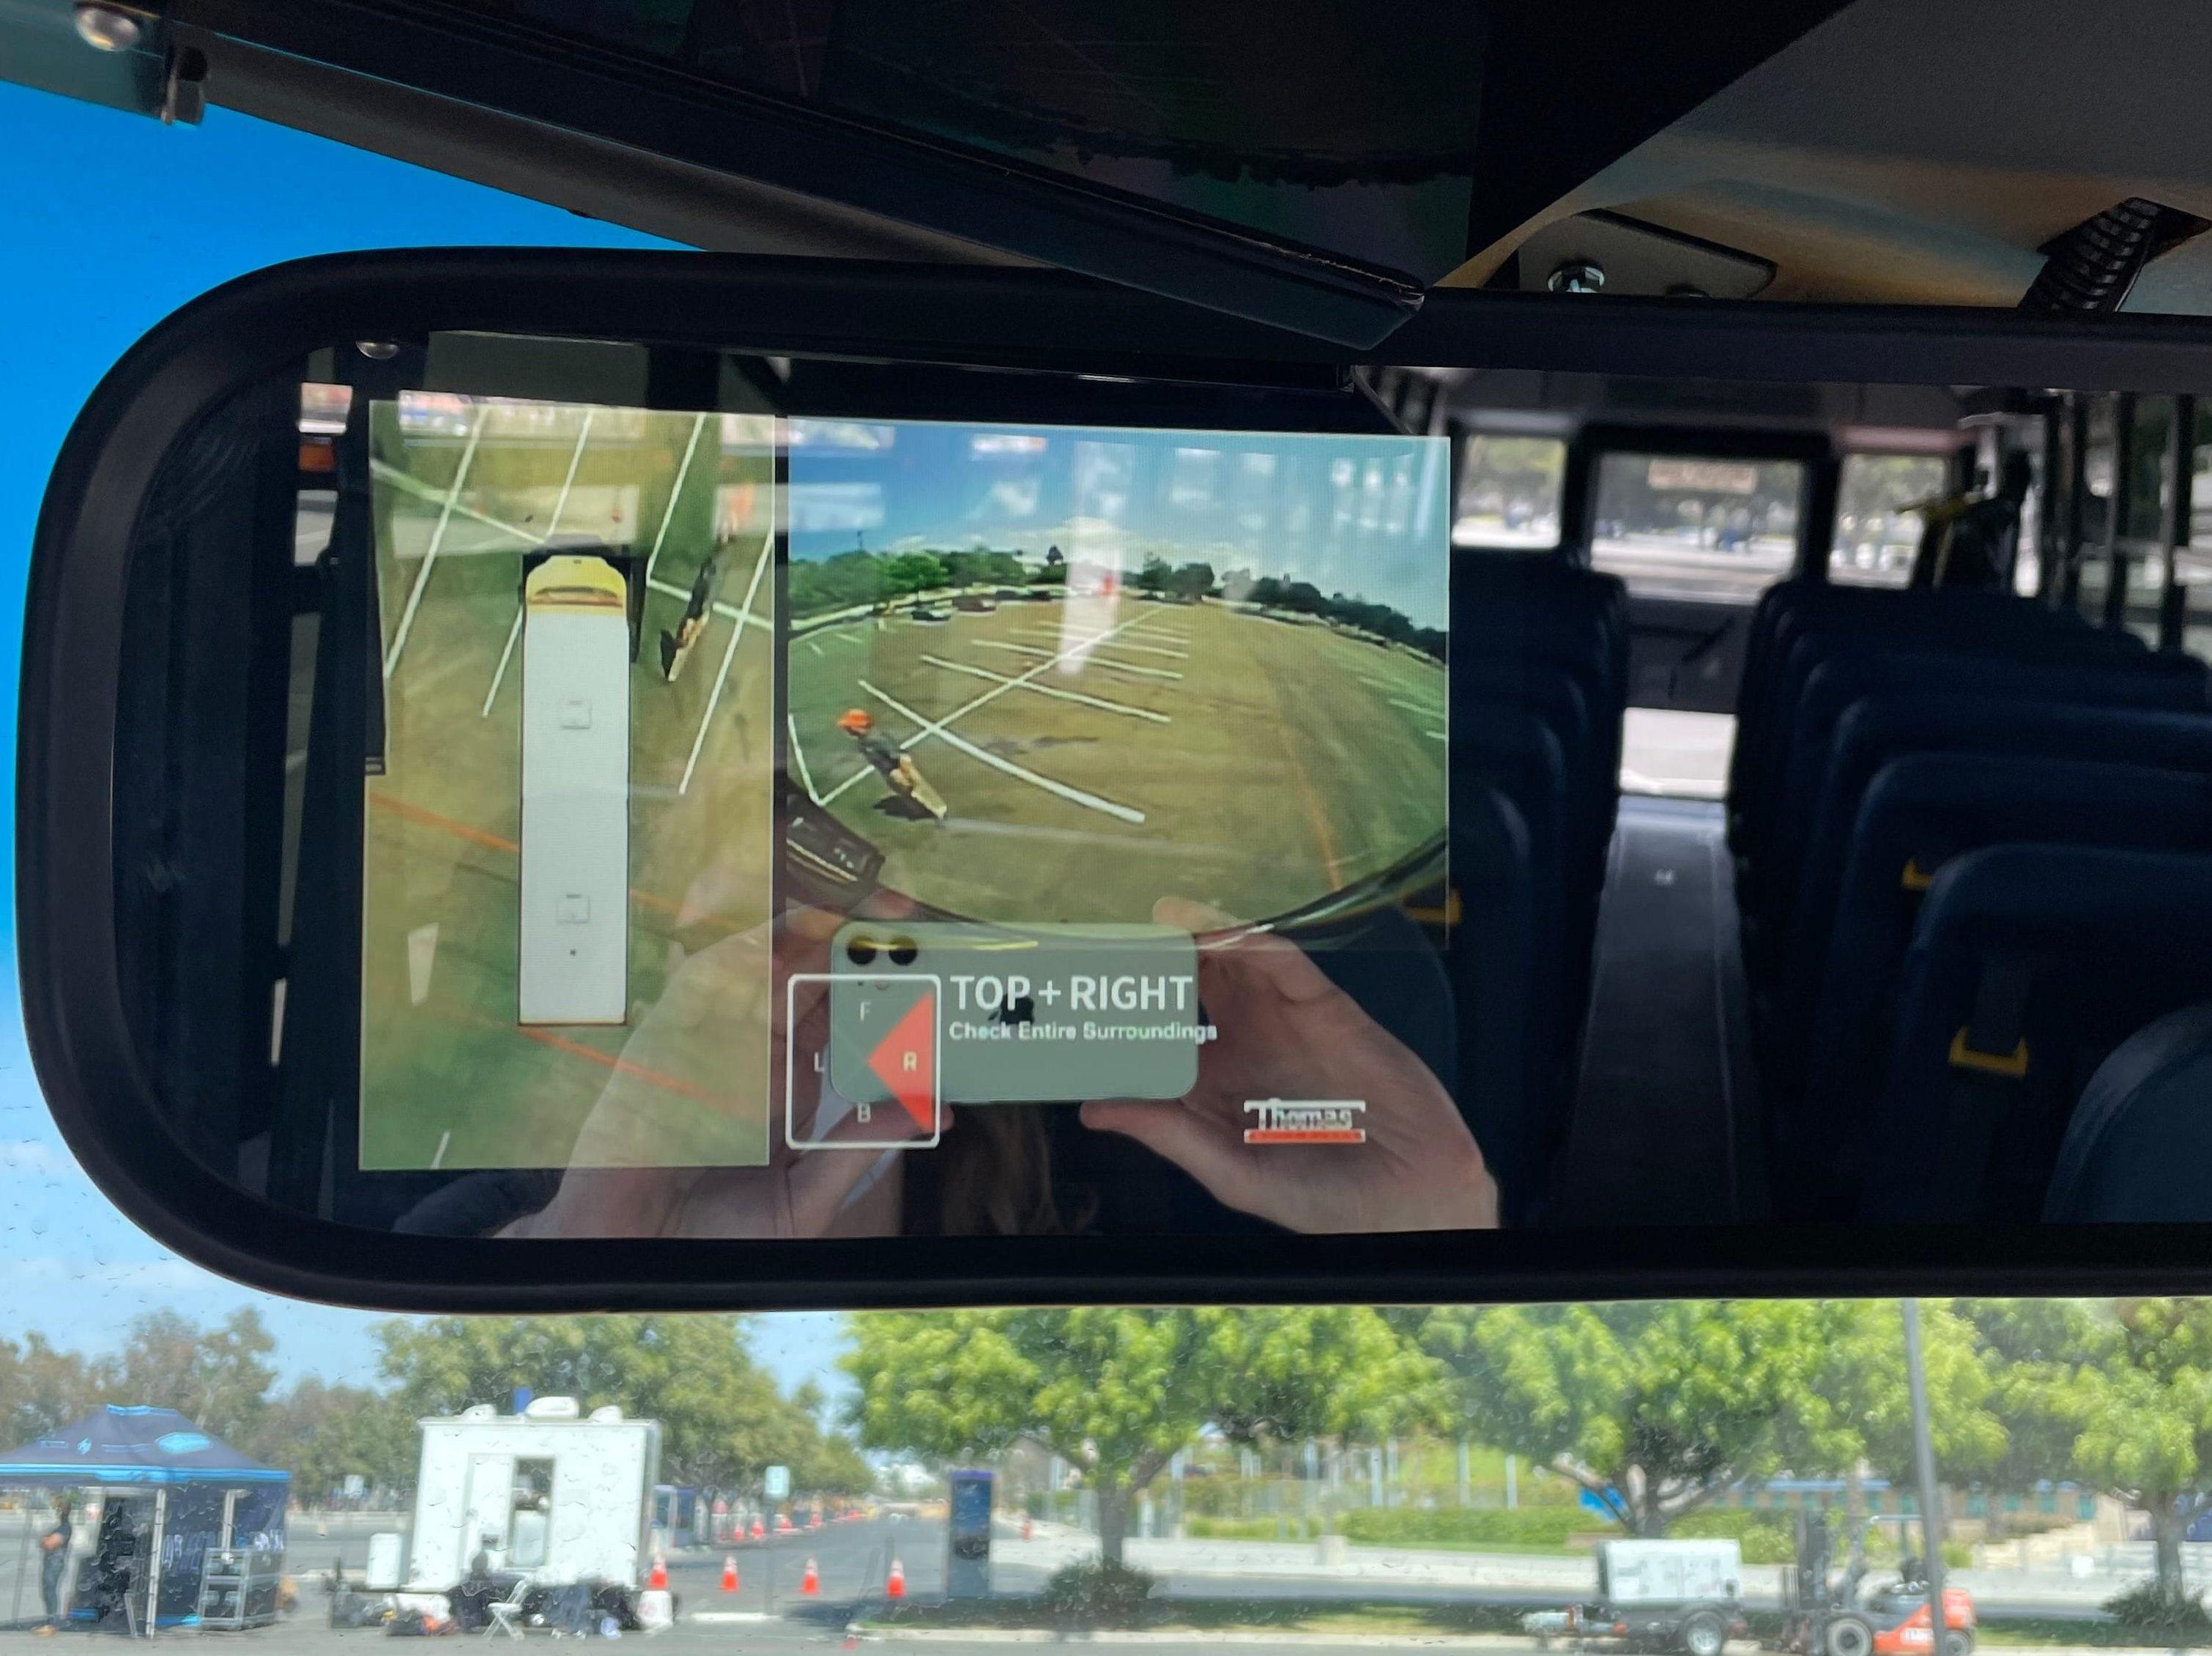 jouley electric school bus rearview mirror